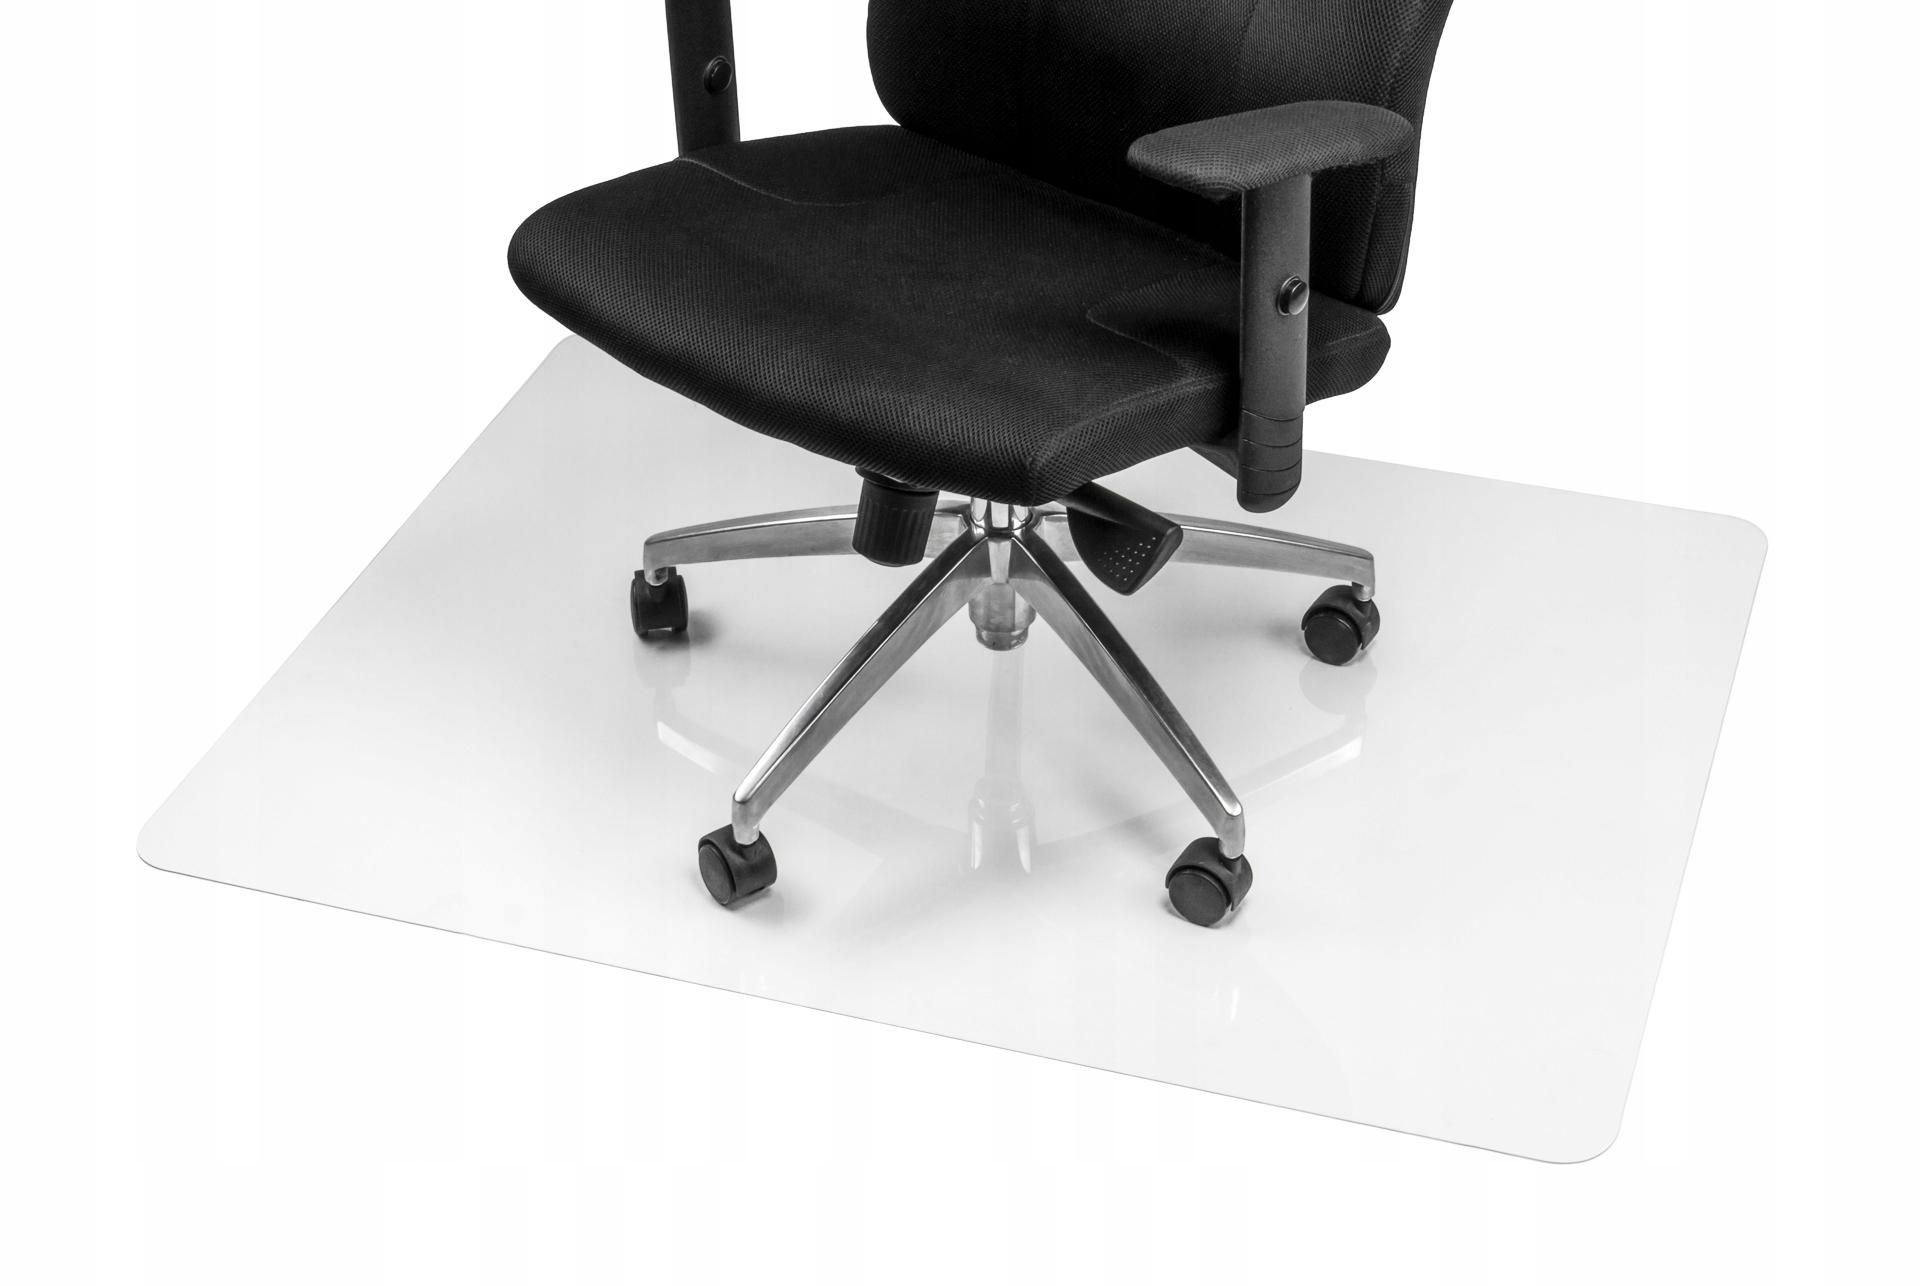 подкладка мат под кресло на размер 0,1 m2